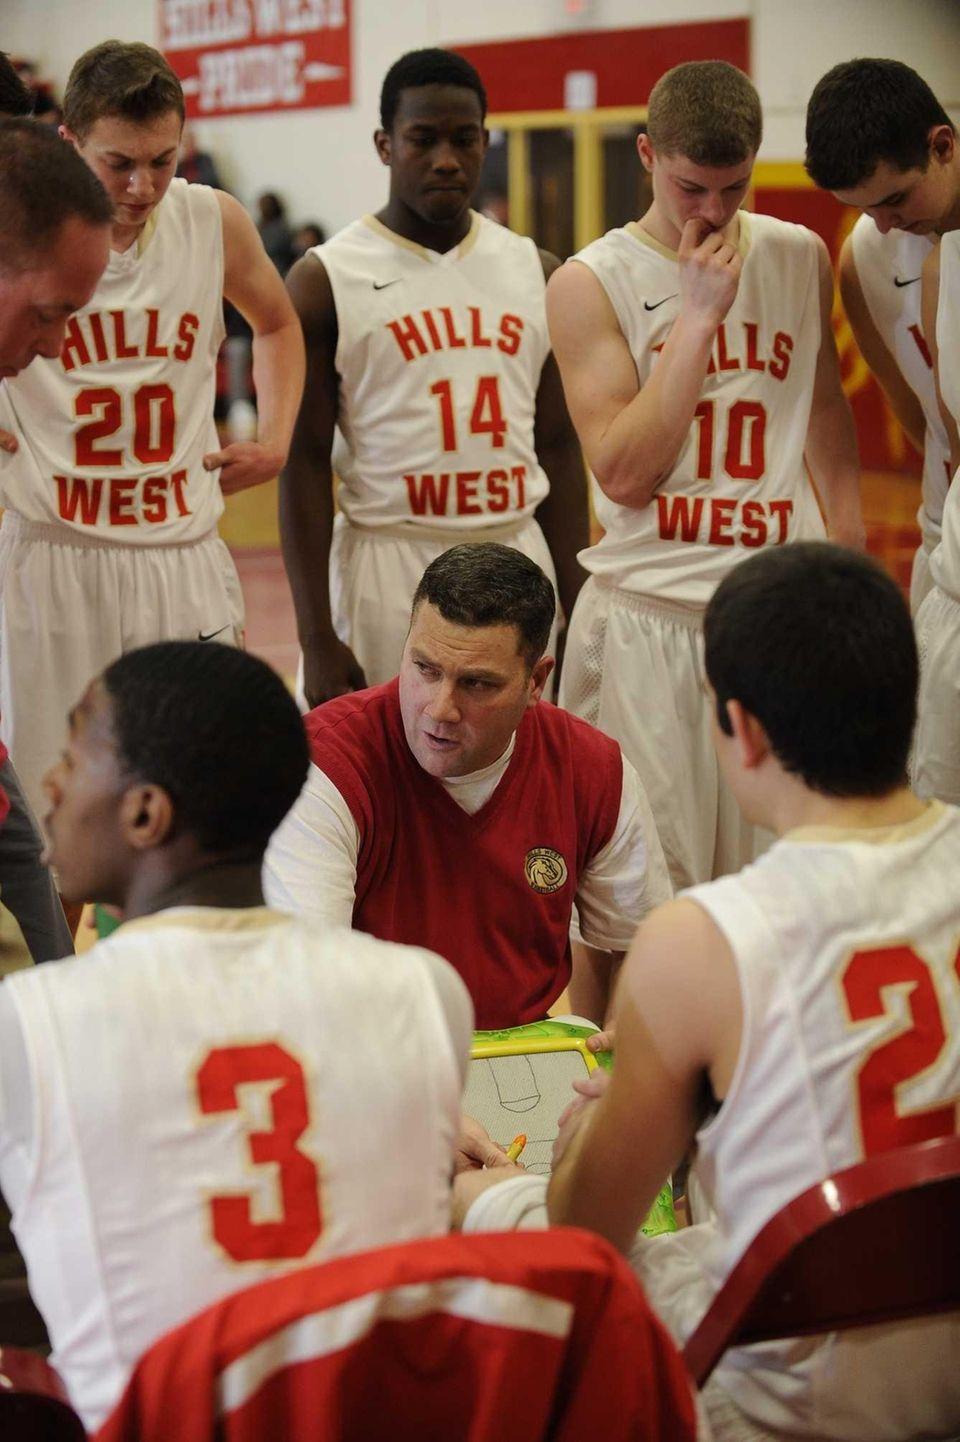 Half Hollow Hills West head coach Bill Mitaritonna